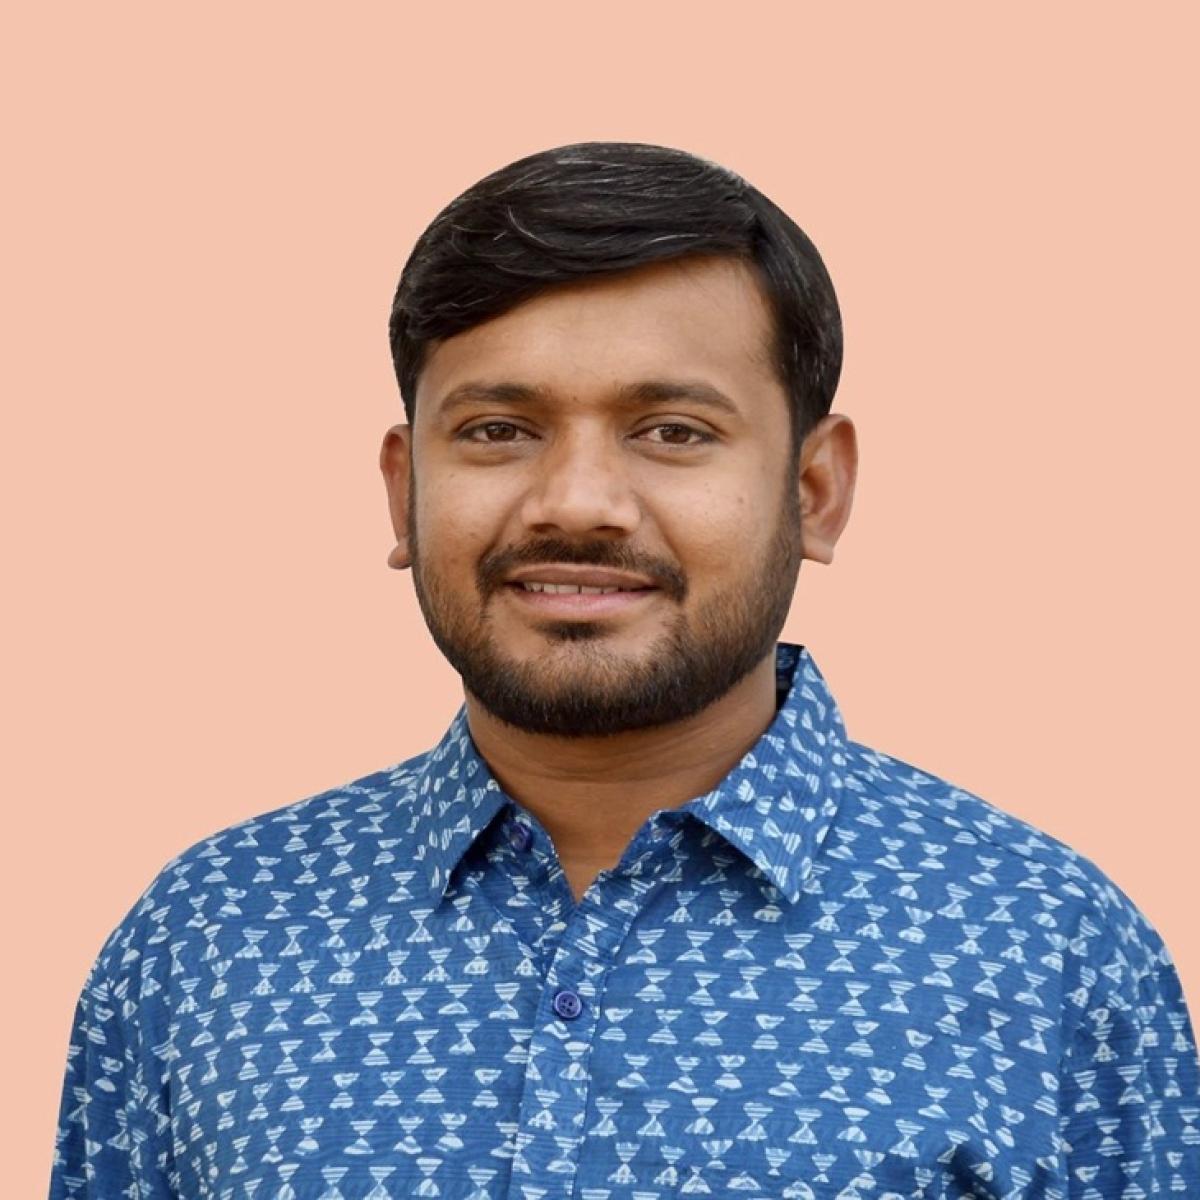 JNU sedition case: HC refuses to direct AAP govt to grant sanction for prosecution of Kanhaiya Kumar